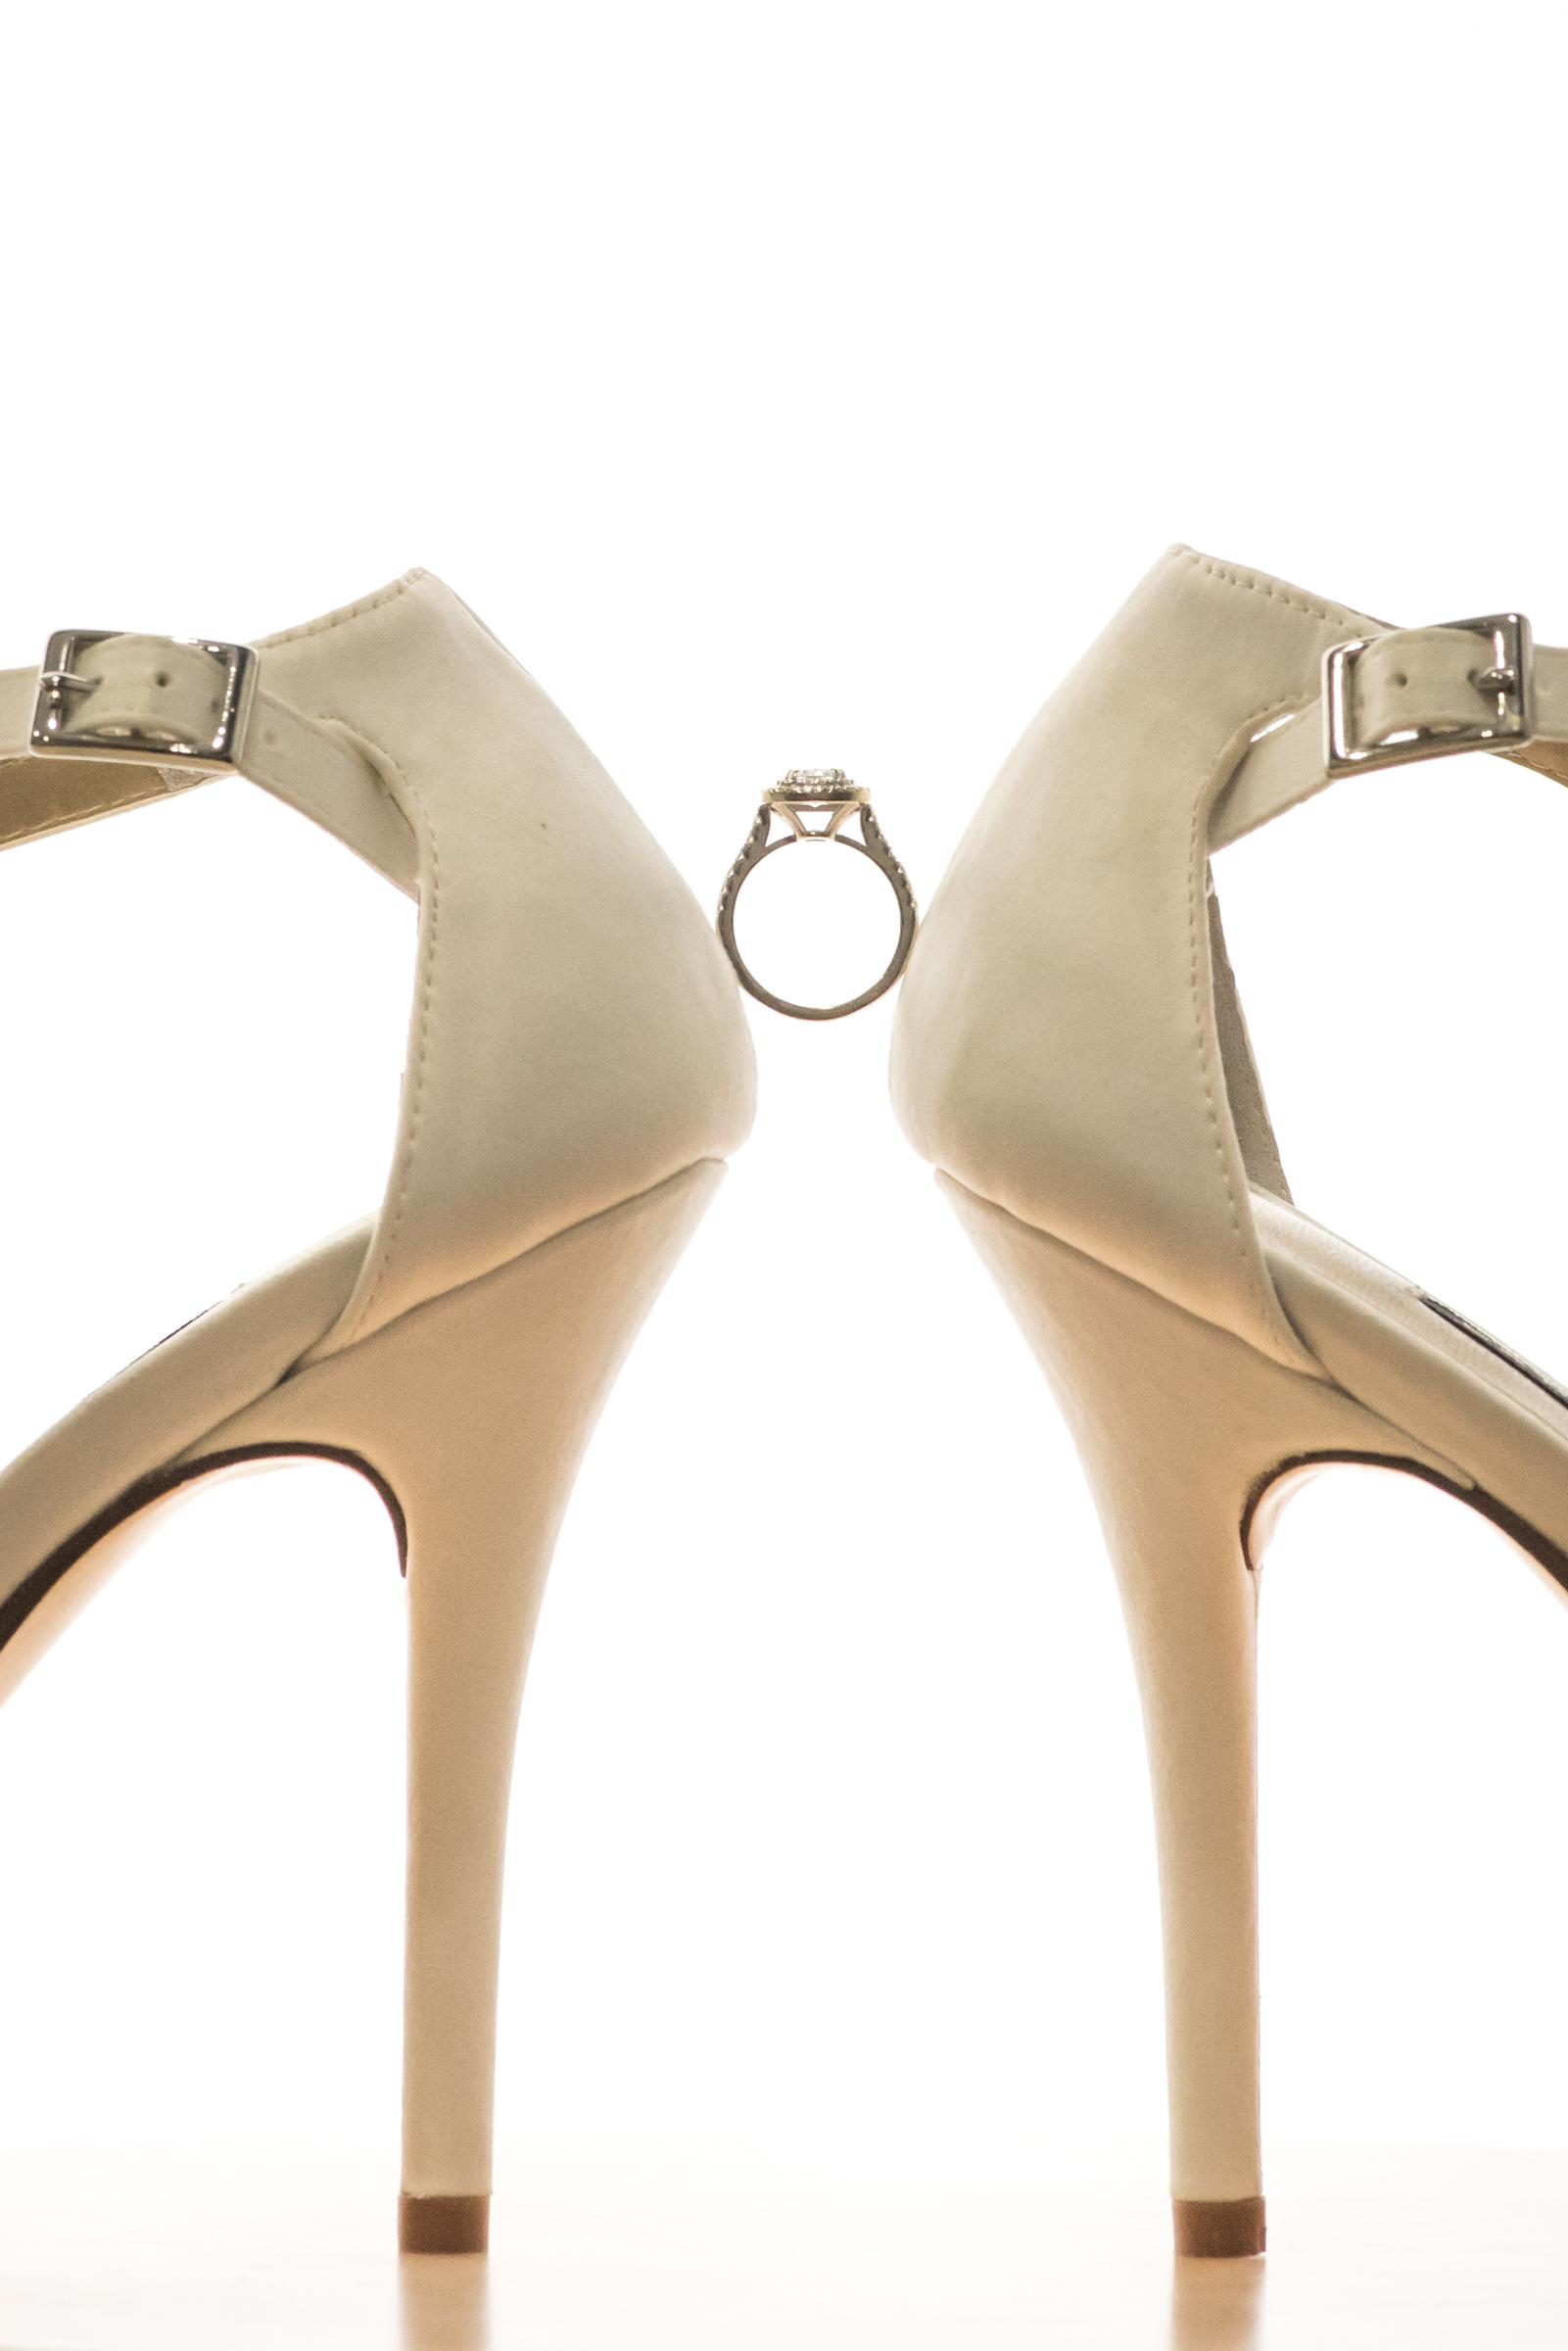 Stefy Hilmer Photography- shoe details photo.jpg